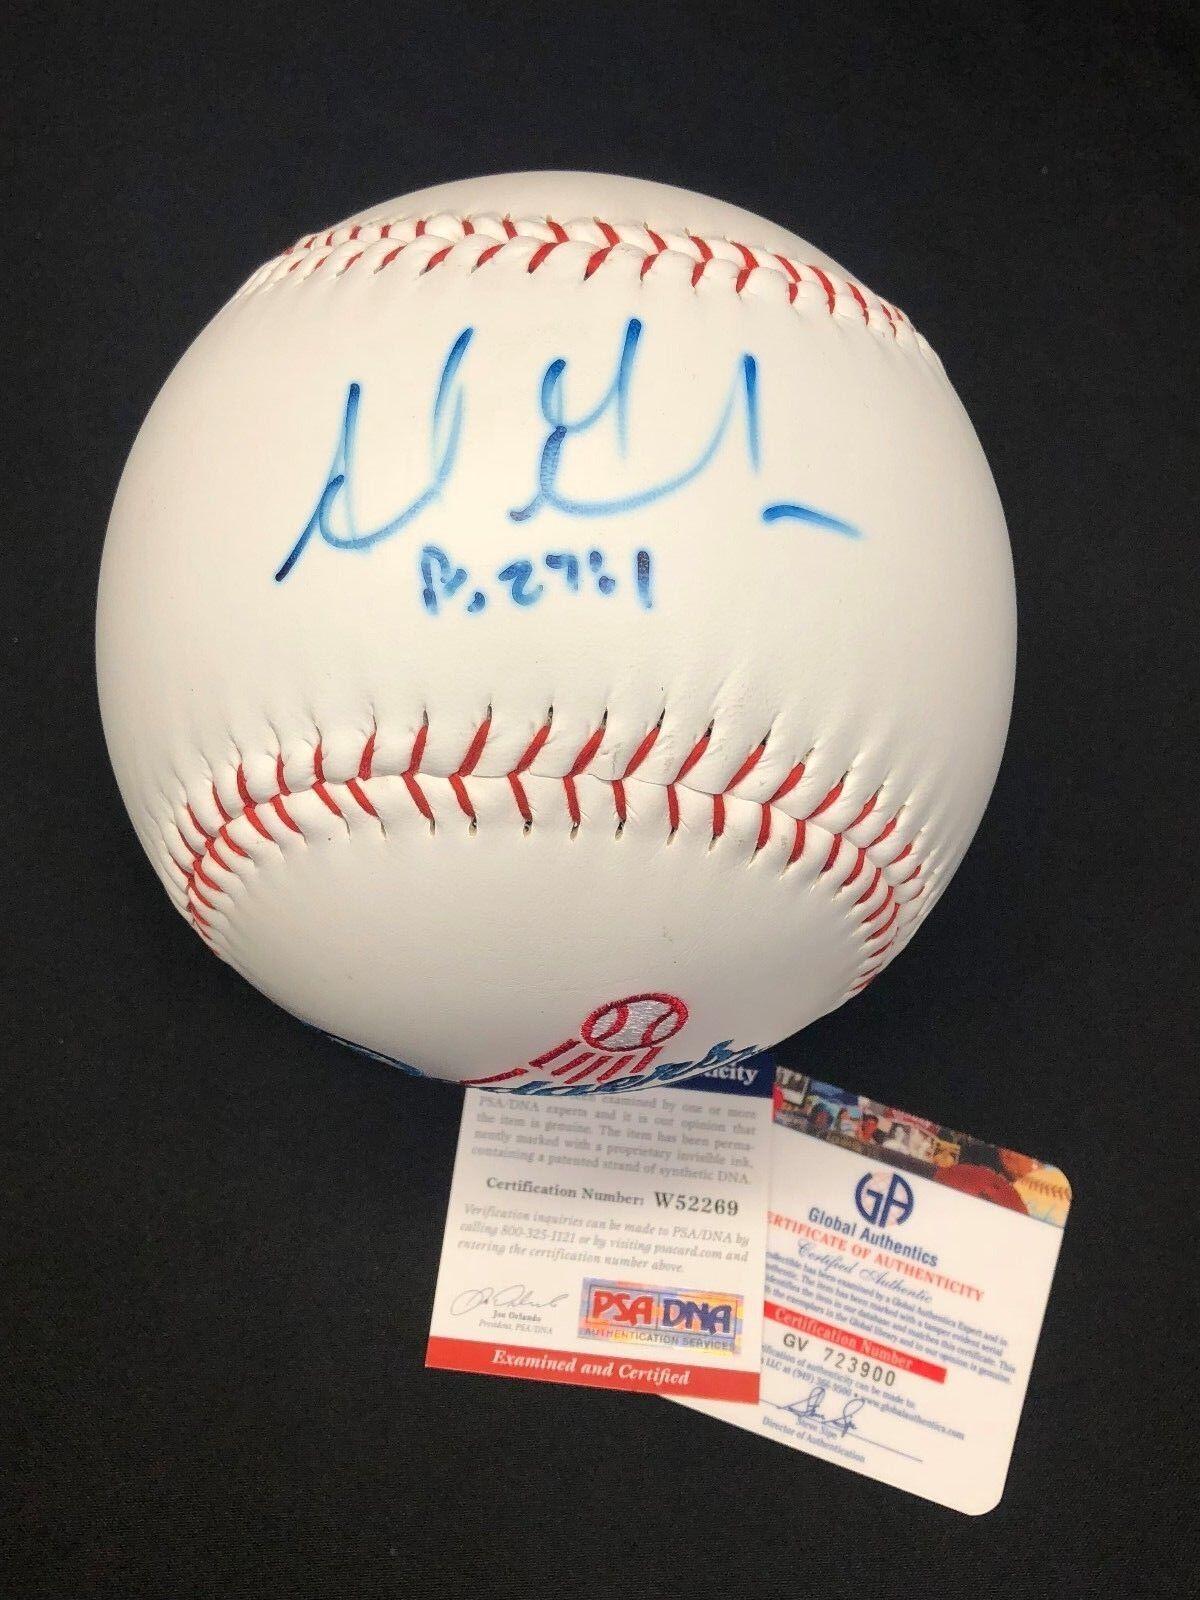 Adrian Gonzalez Signed Oversized Dodgers Rawlings Baseball PSA W52269